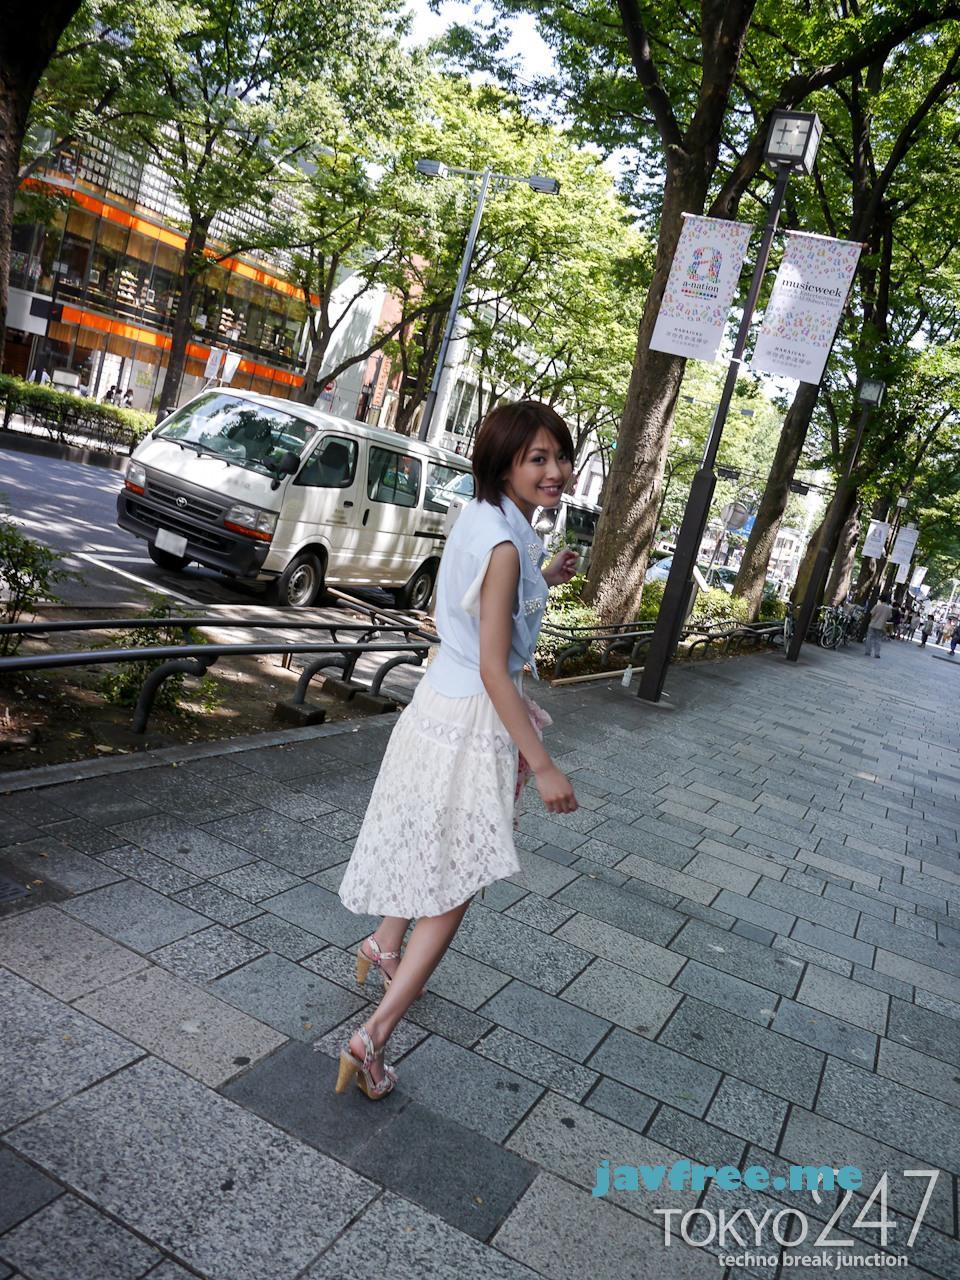 Tokyo 247 406yuuki夏目優希 夏目優希 Tokyo 247